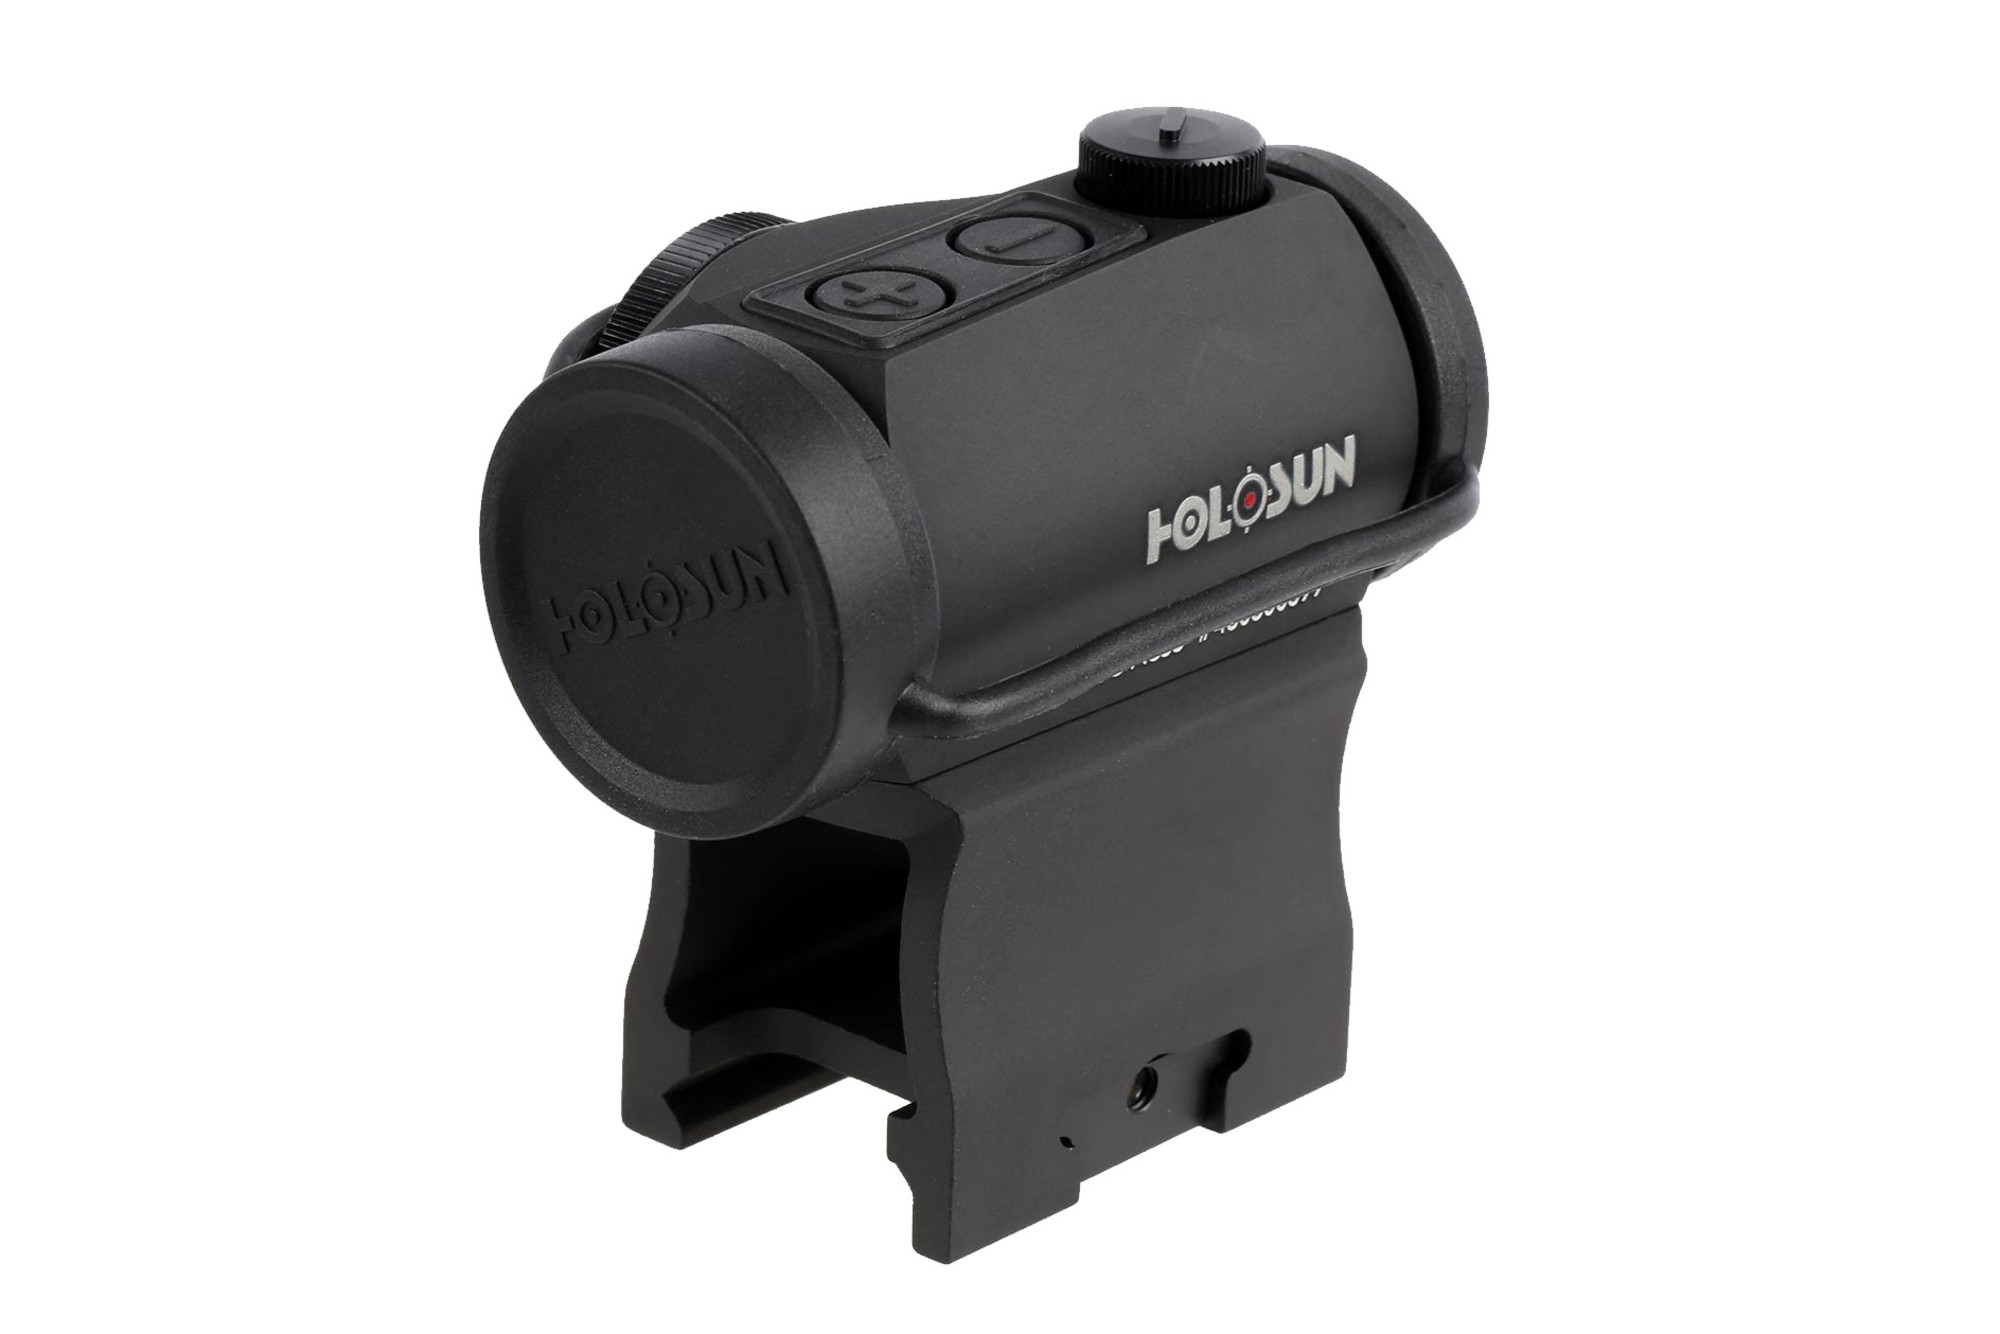 Holosun Holosun HS503G with ACSS-CQB Reticle